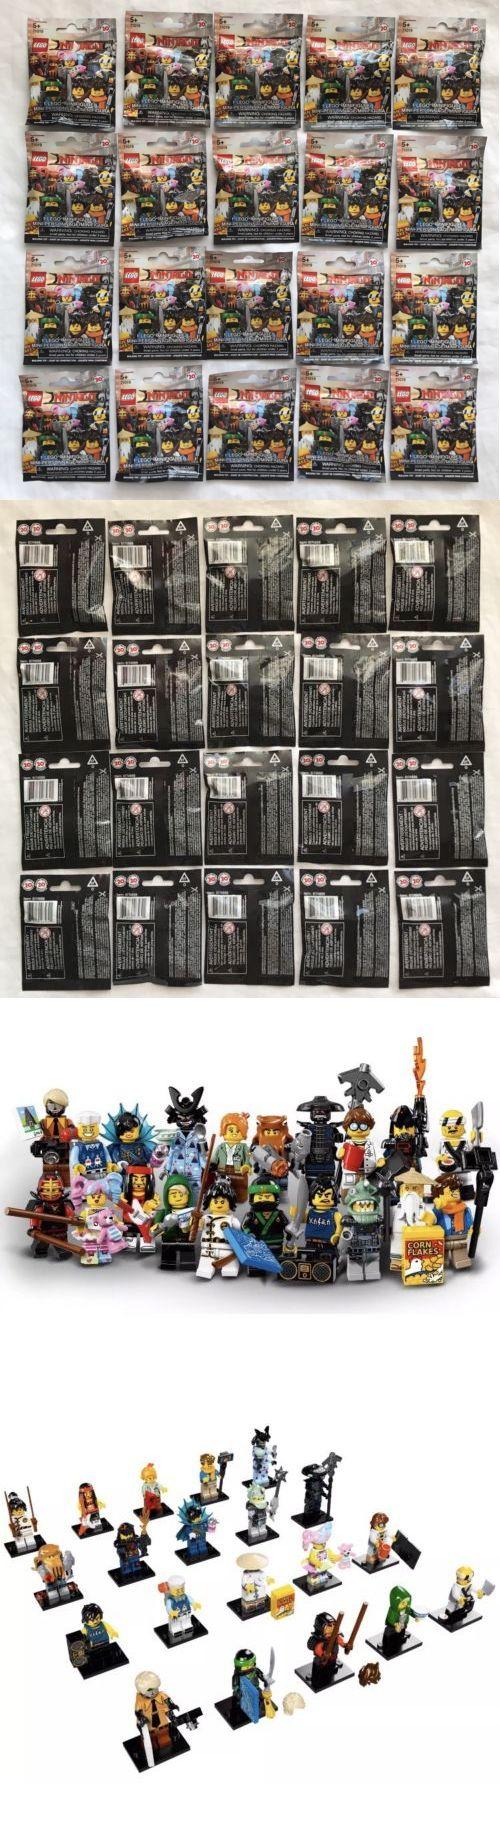 Minifigures Lego Minifigures Lego Ninjago Movie plete Set Factory